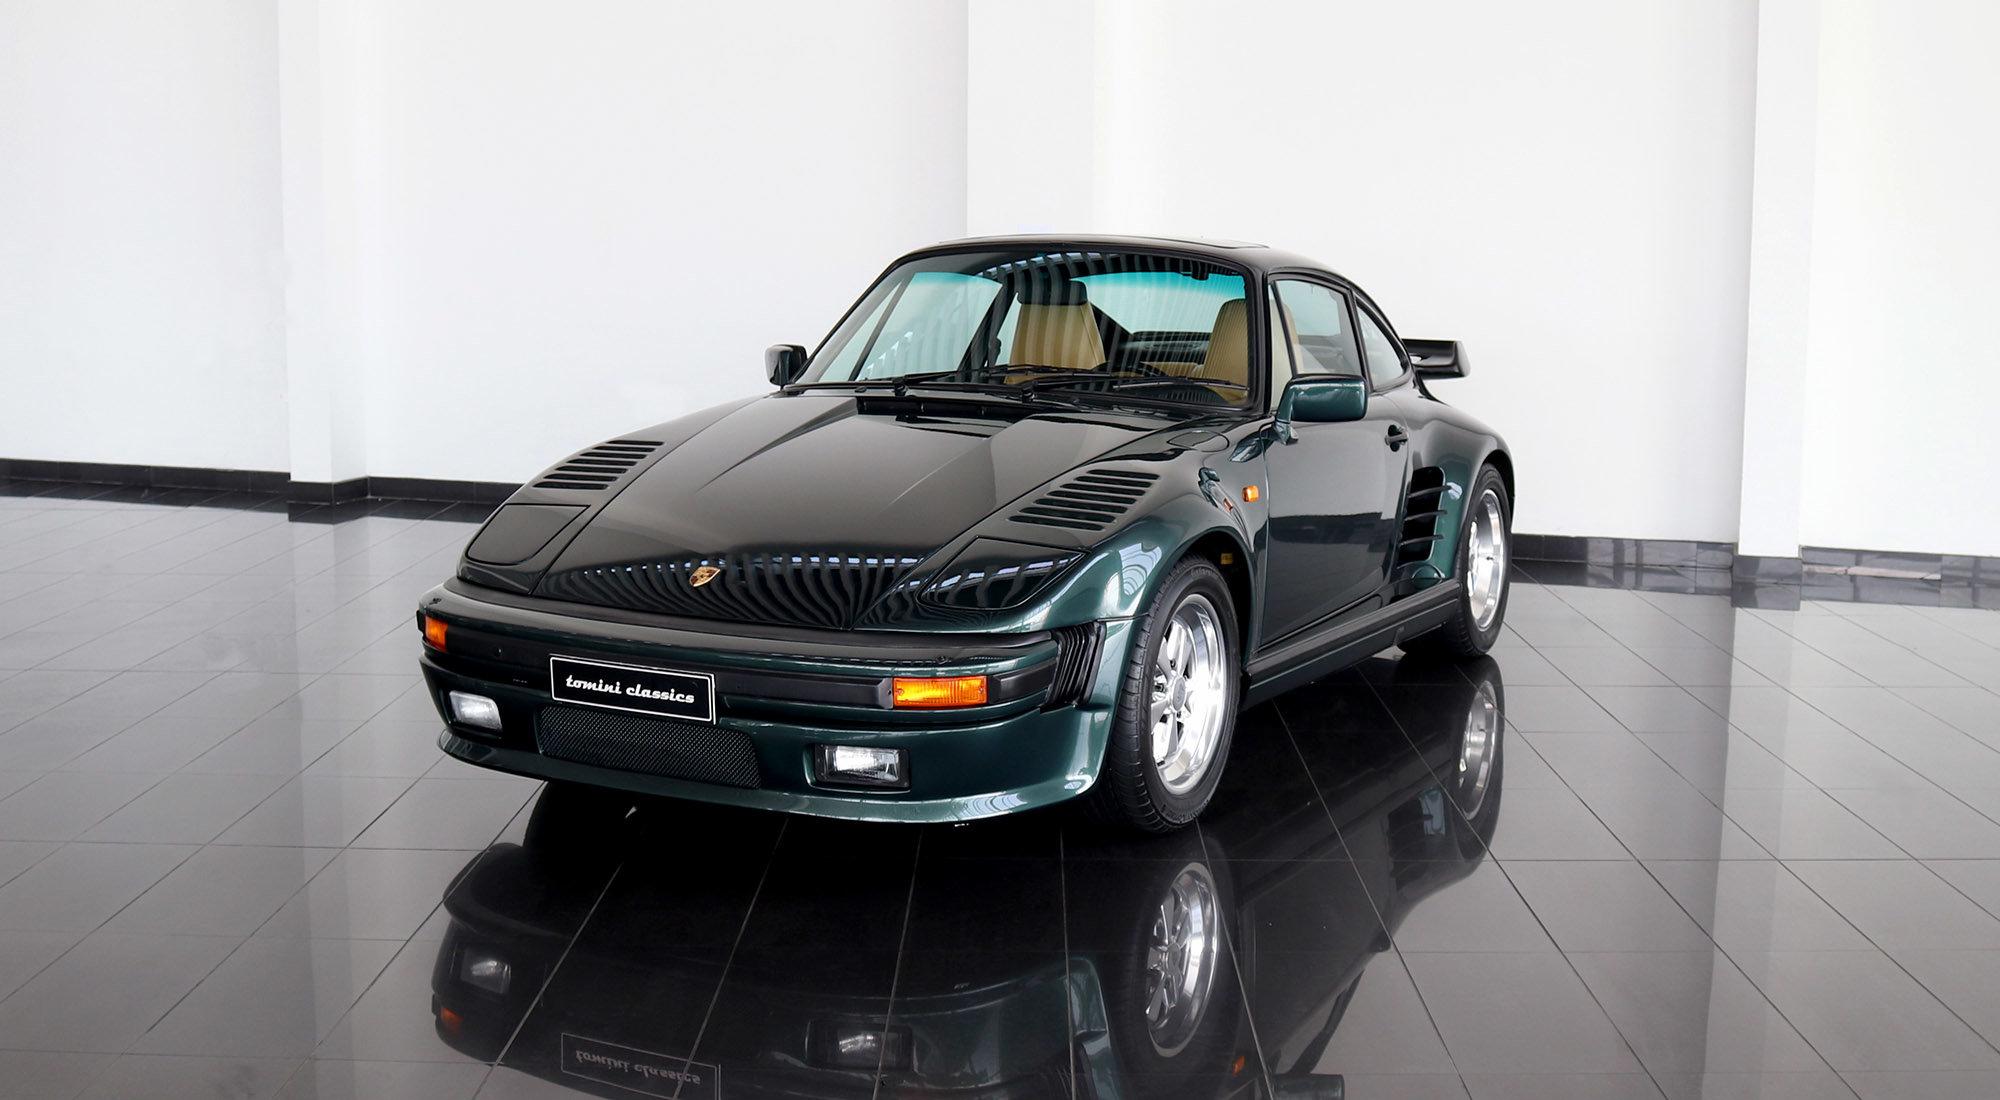 Porsche 930 SE Slantnose / Flachbau (1986) For Sale (picture 2 of 6)